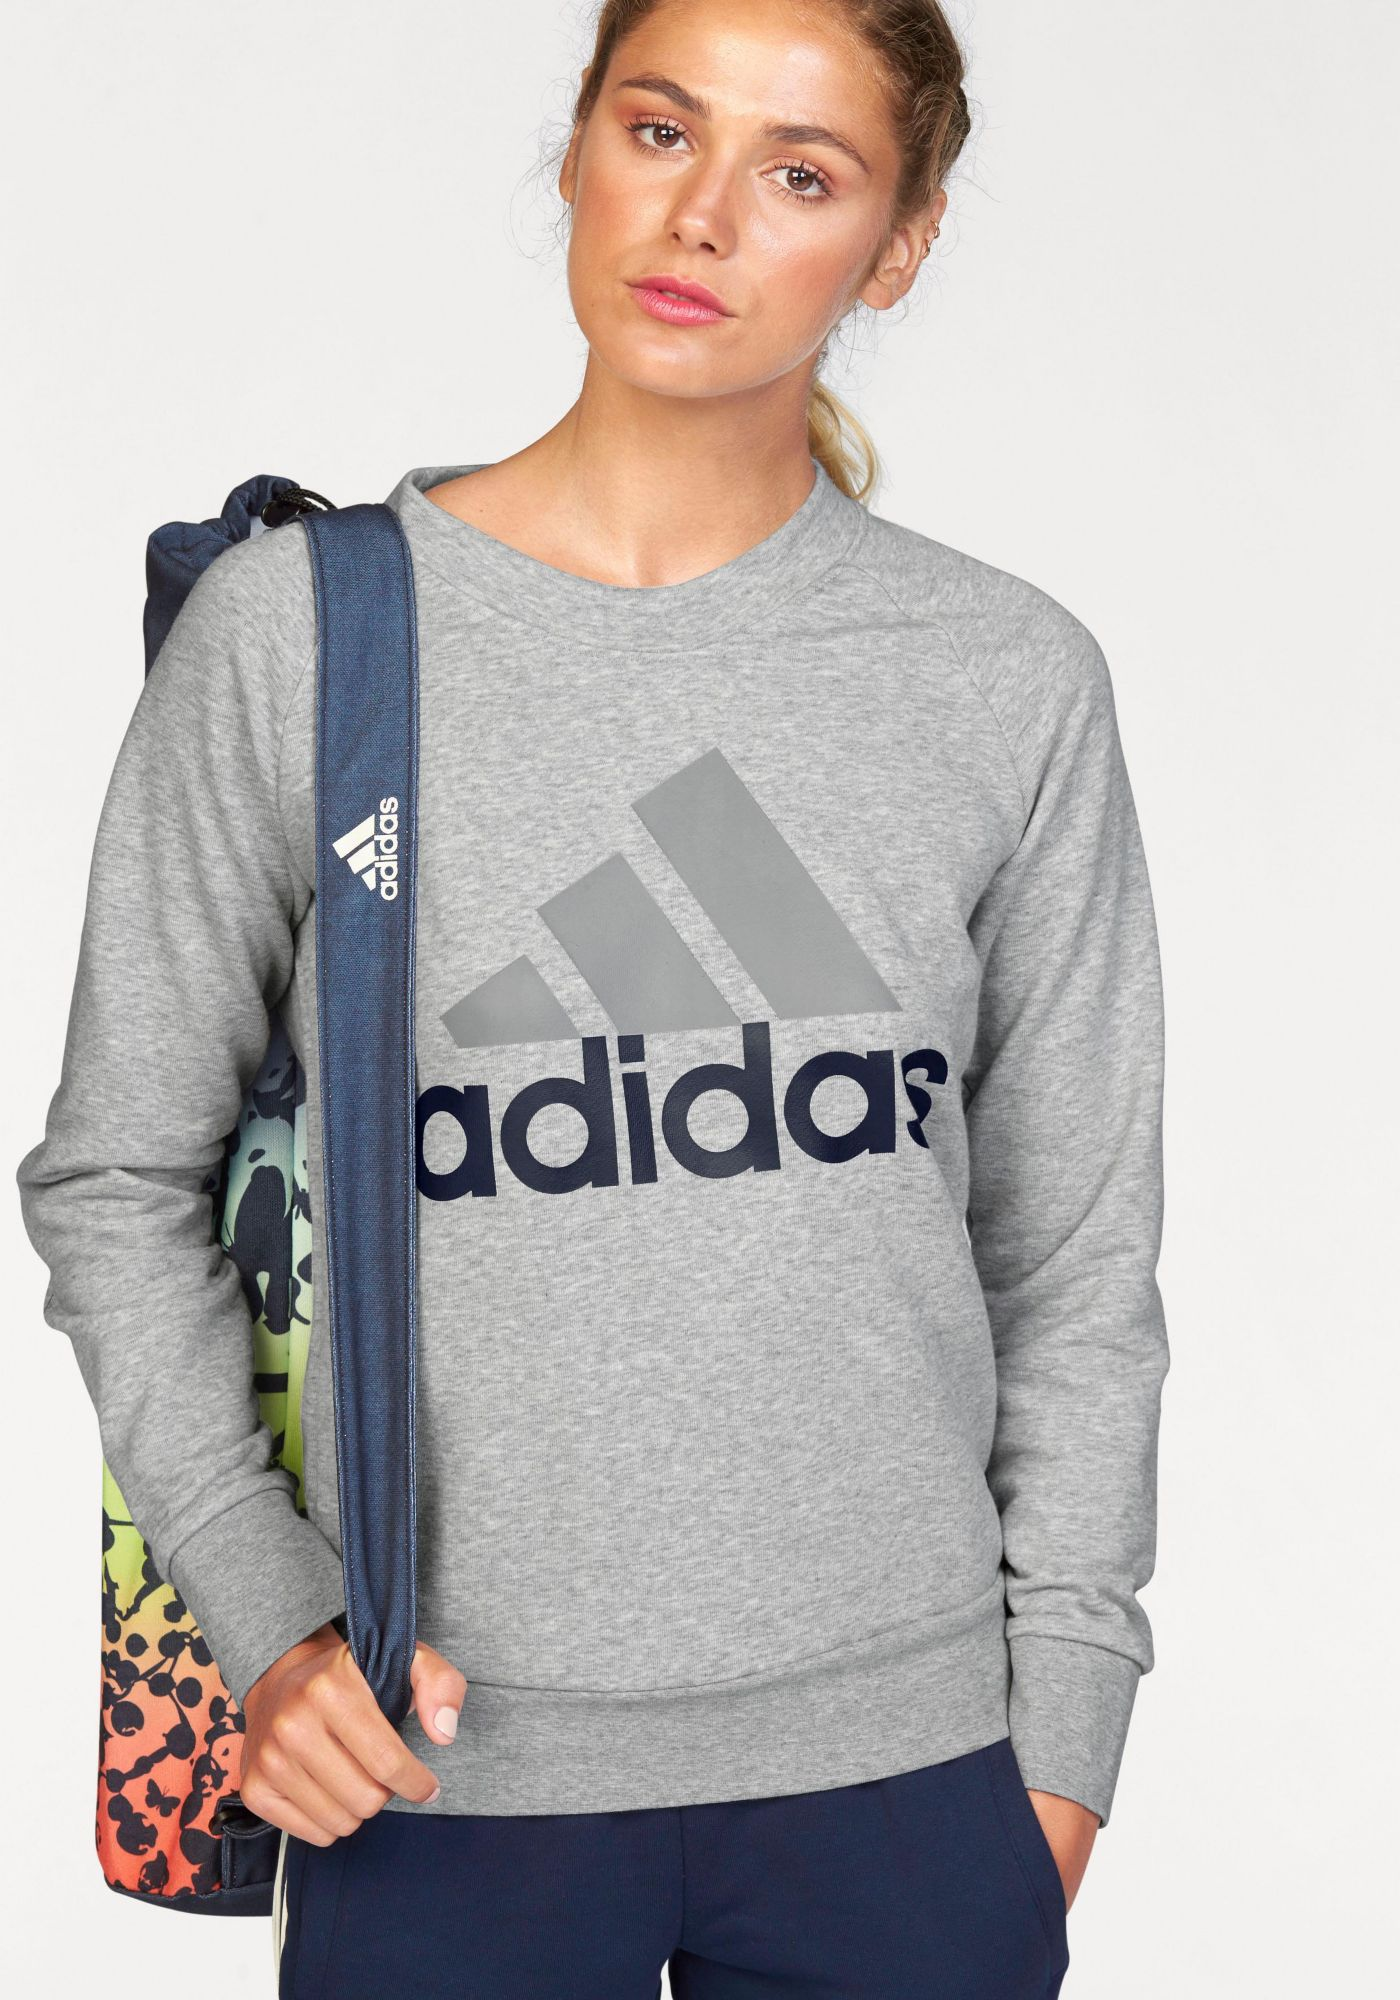 ADIDAS PERFORMANCE adidas Performance Sweatshirt »ESSENTIALS LINEAR CREWNECK SWEATSHIRT«